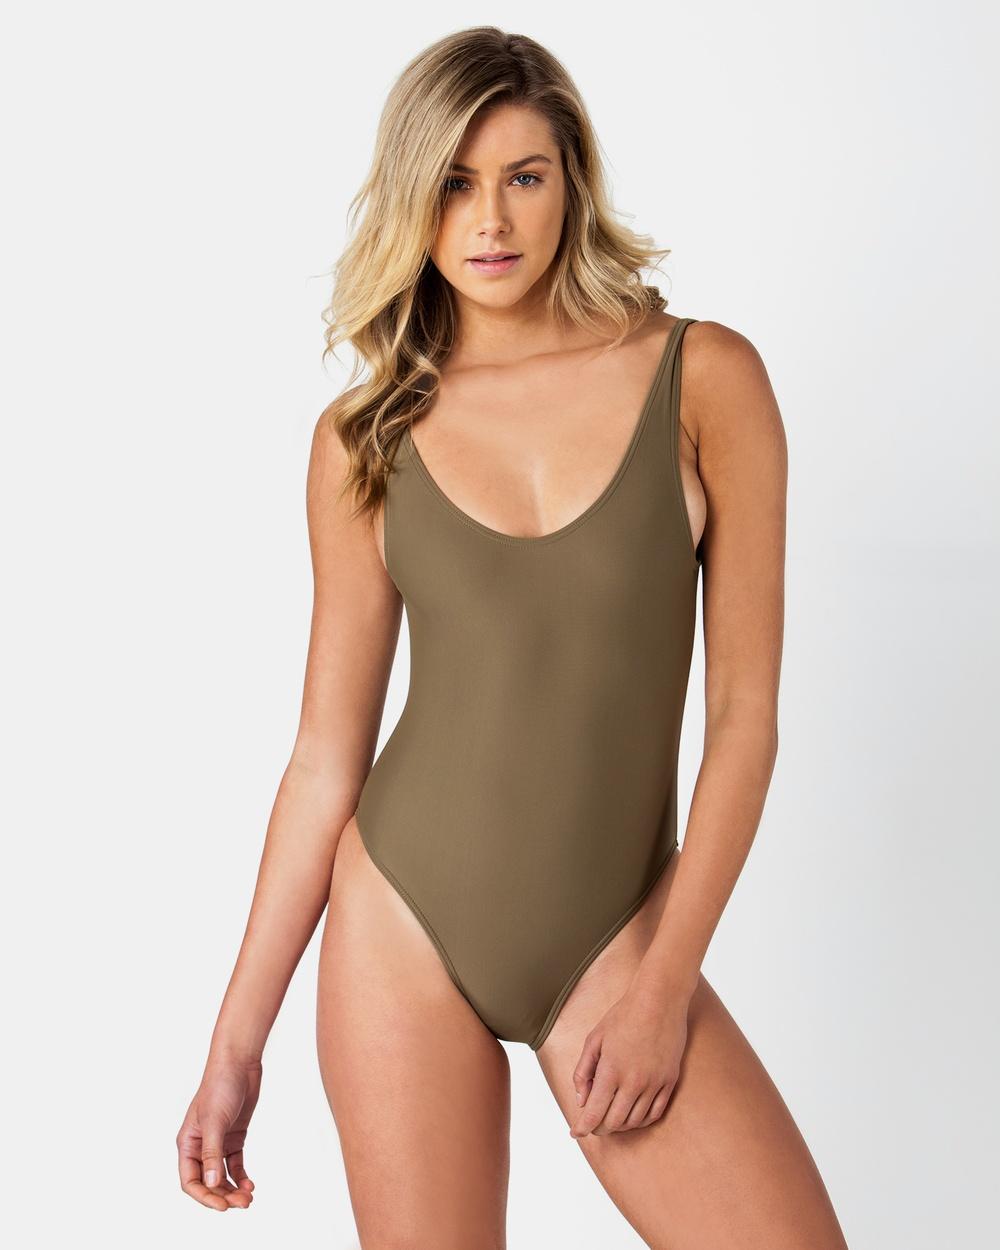 ONEBYONE Blank Swimsuit One-Piece / Swimsuit Khaki Blank Swimsuit